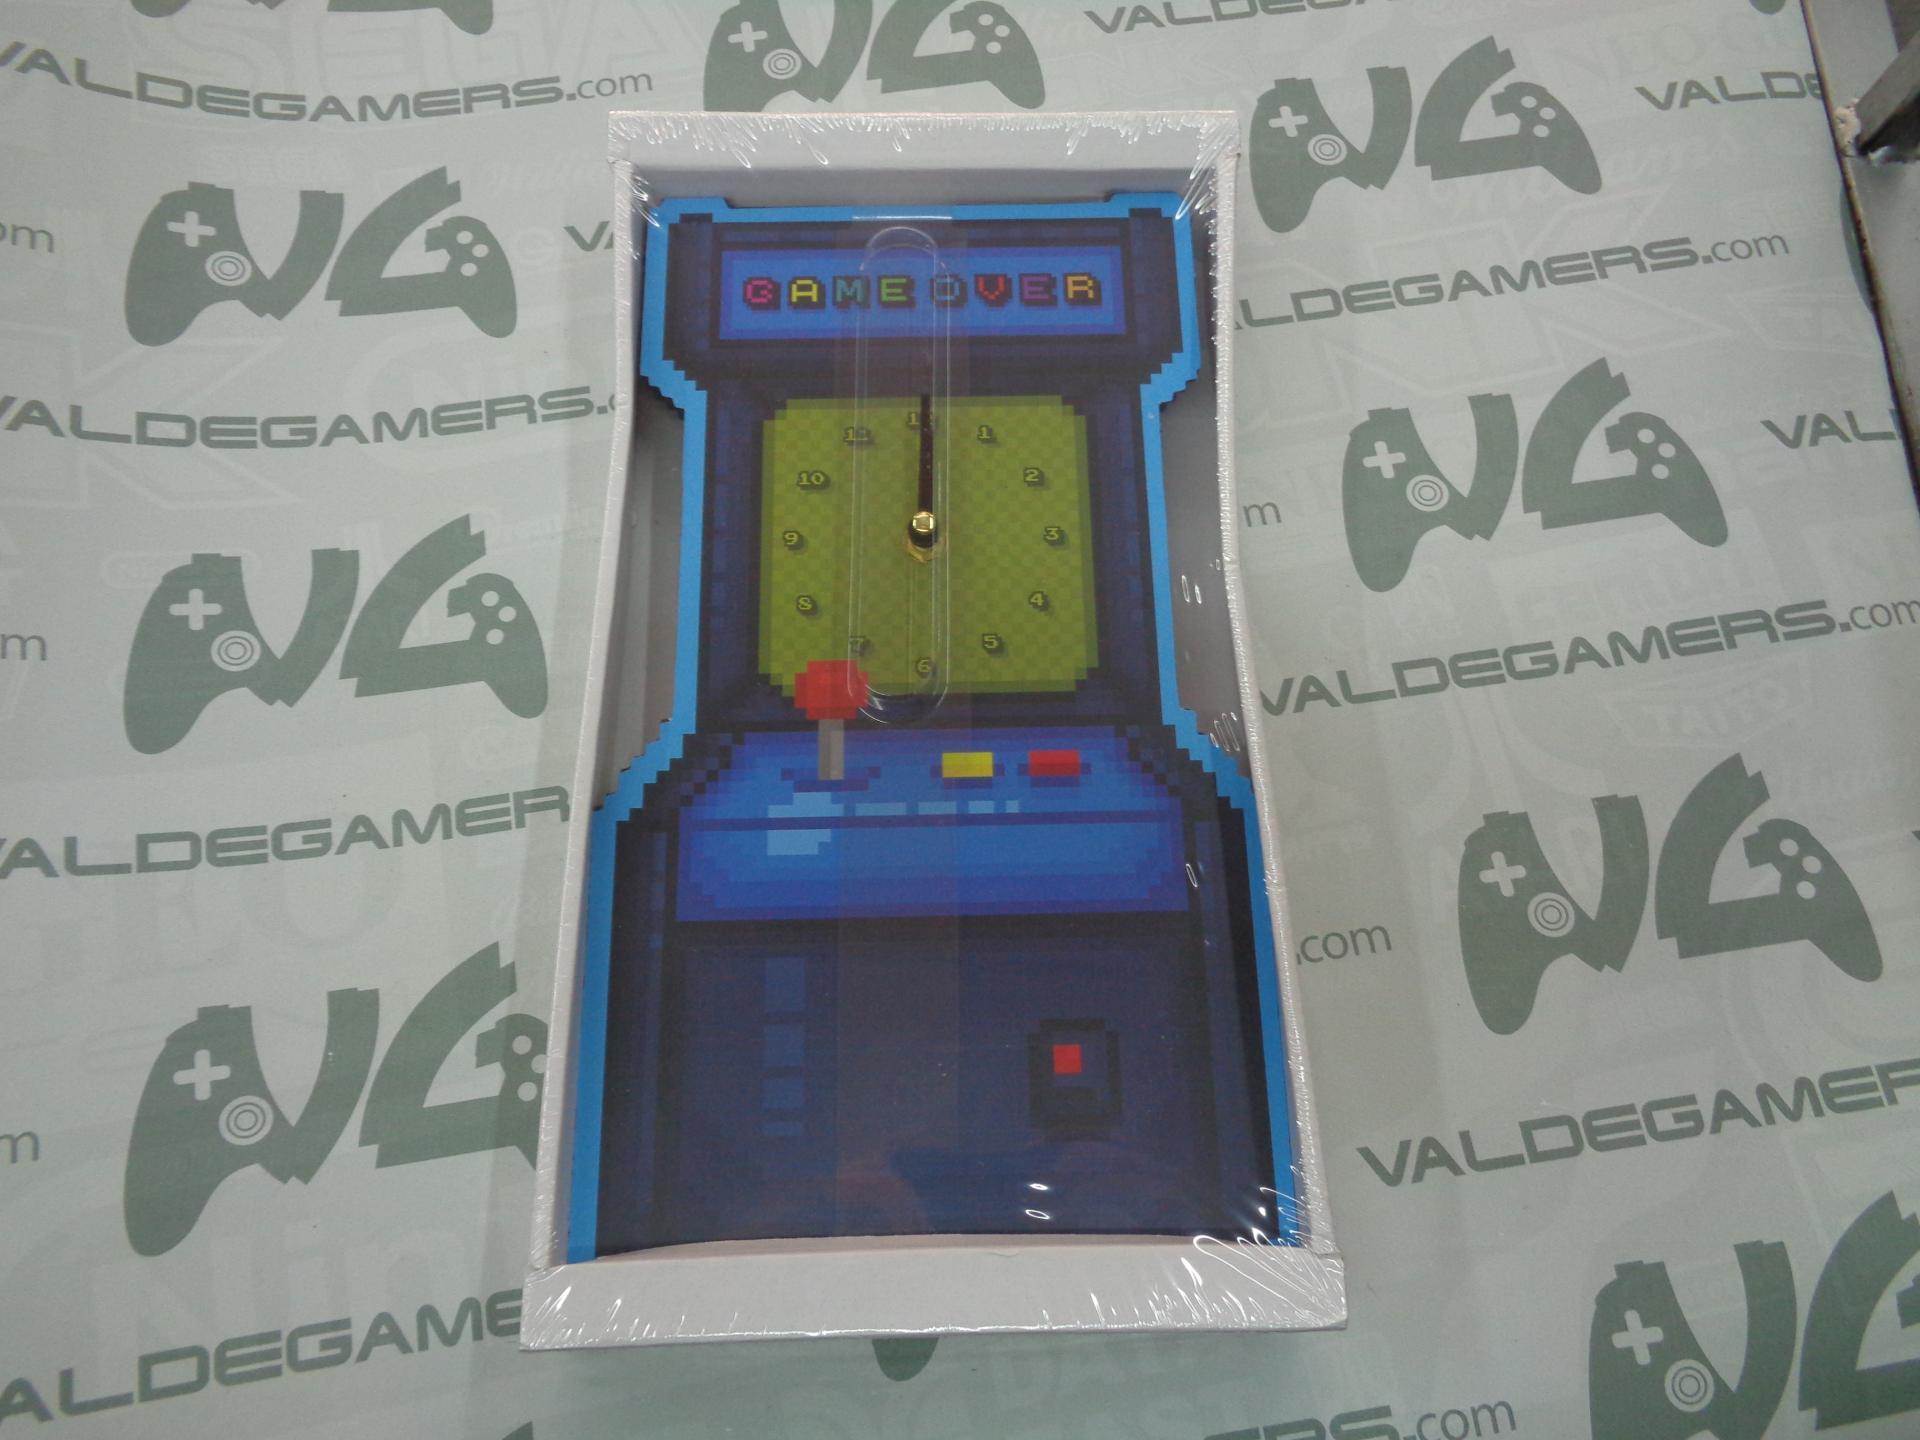 Reloj Arcade game over